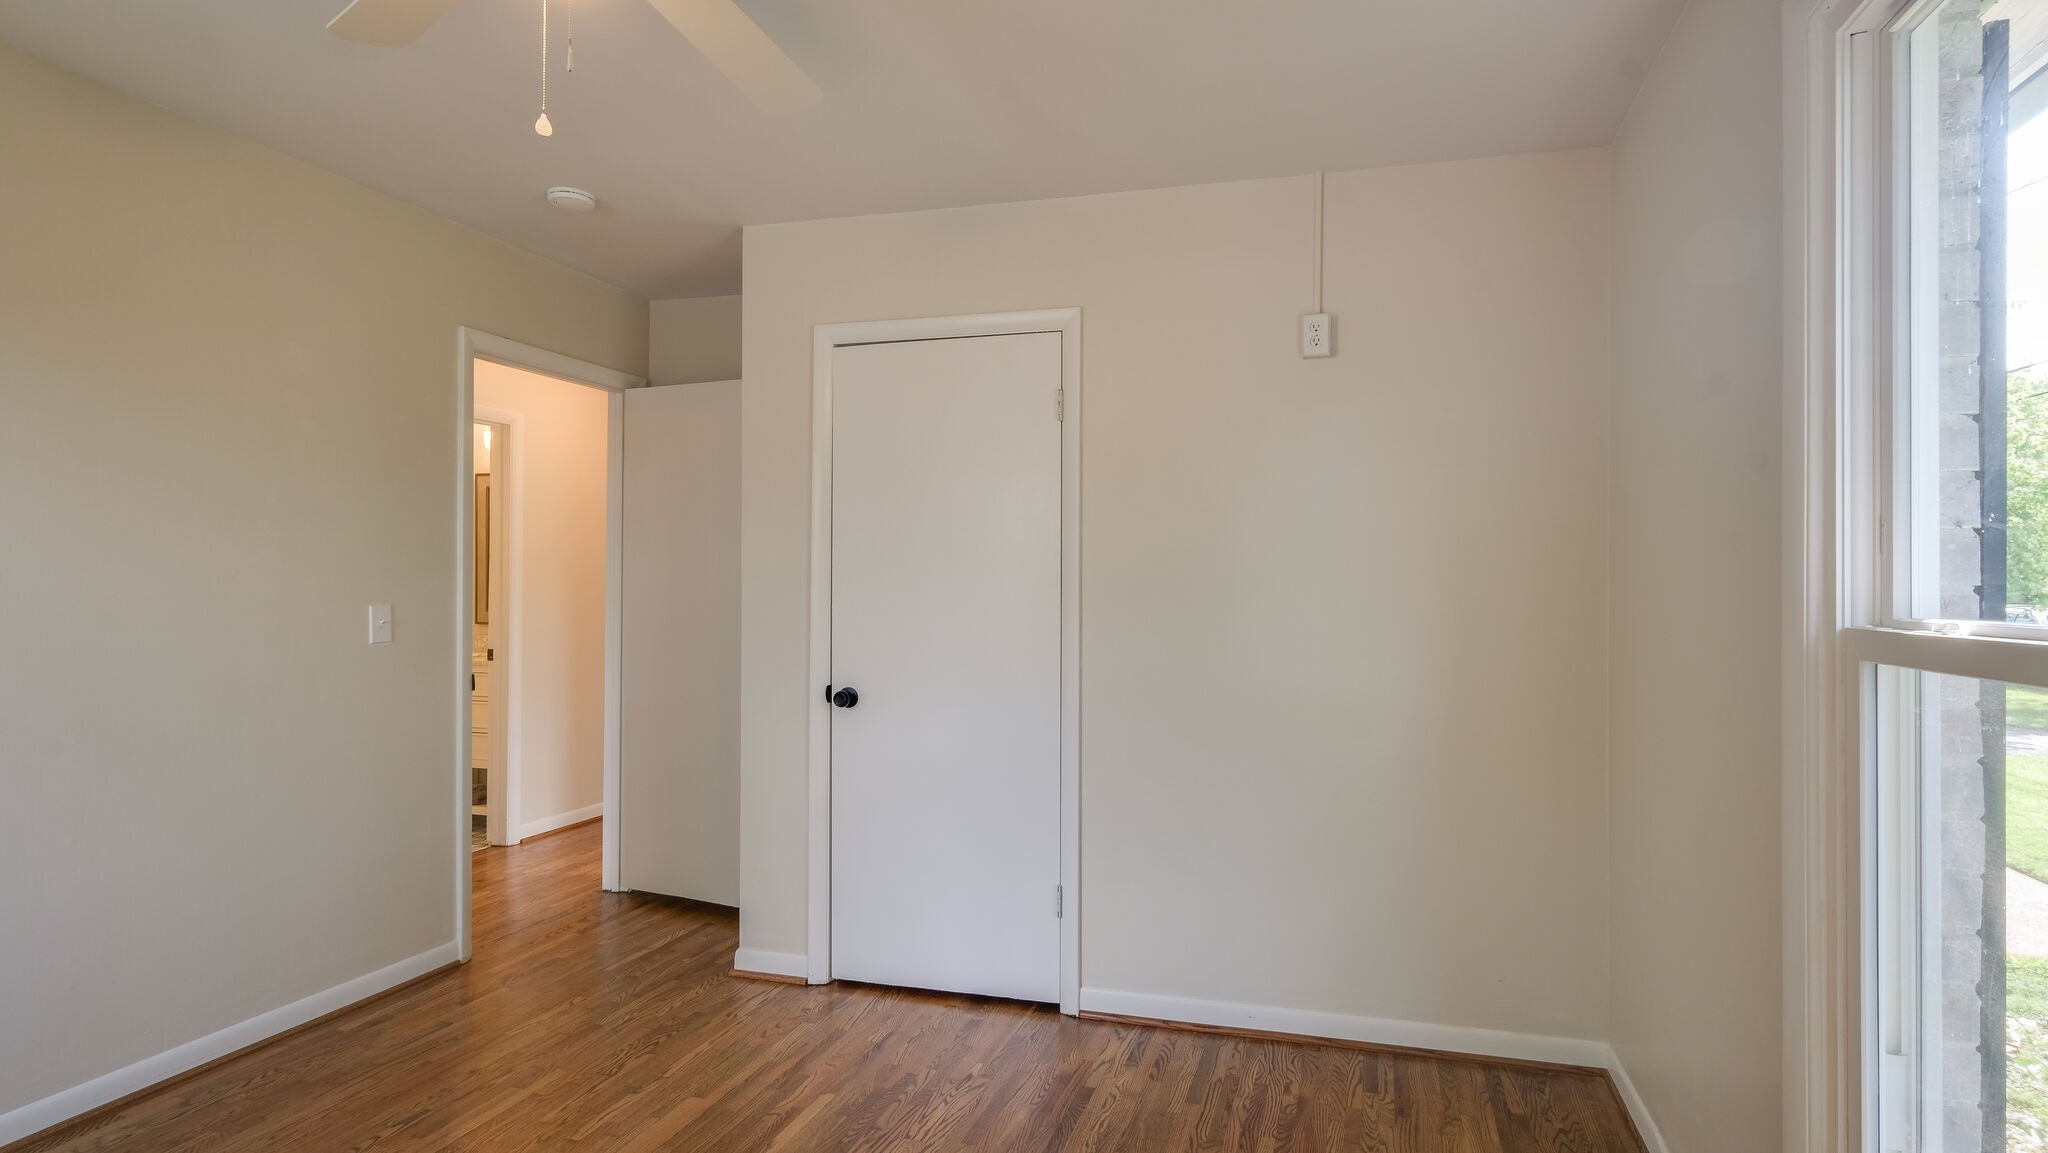 253 New Sawyer Brown Rd